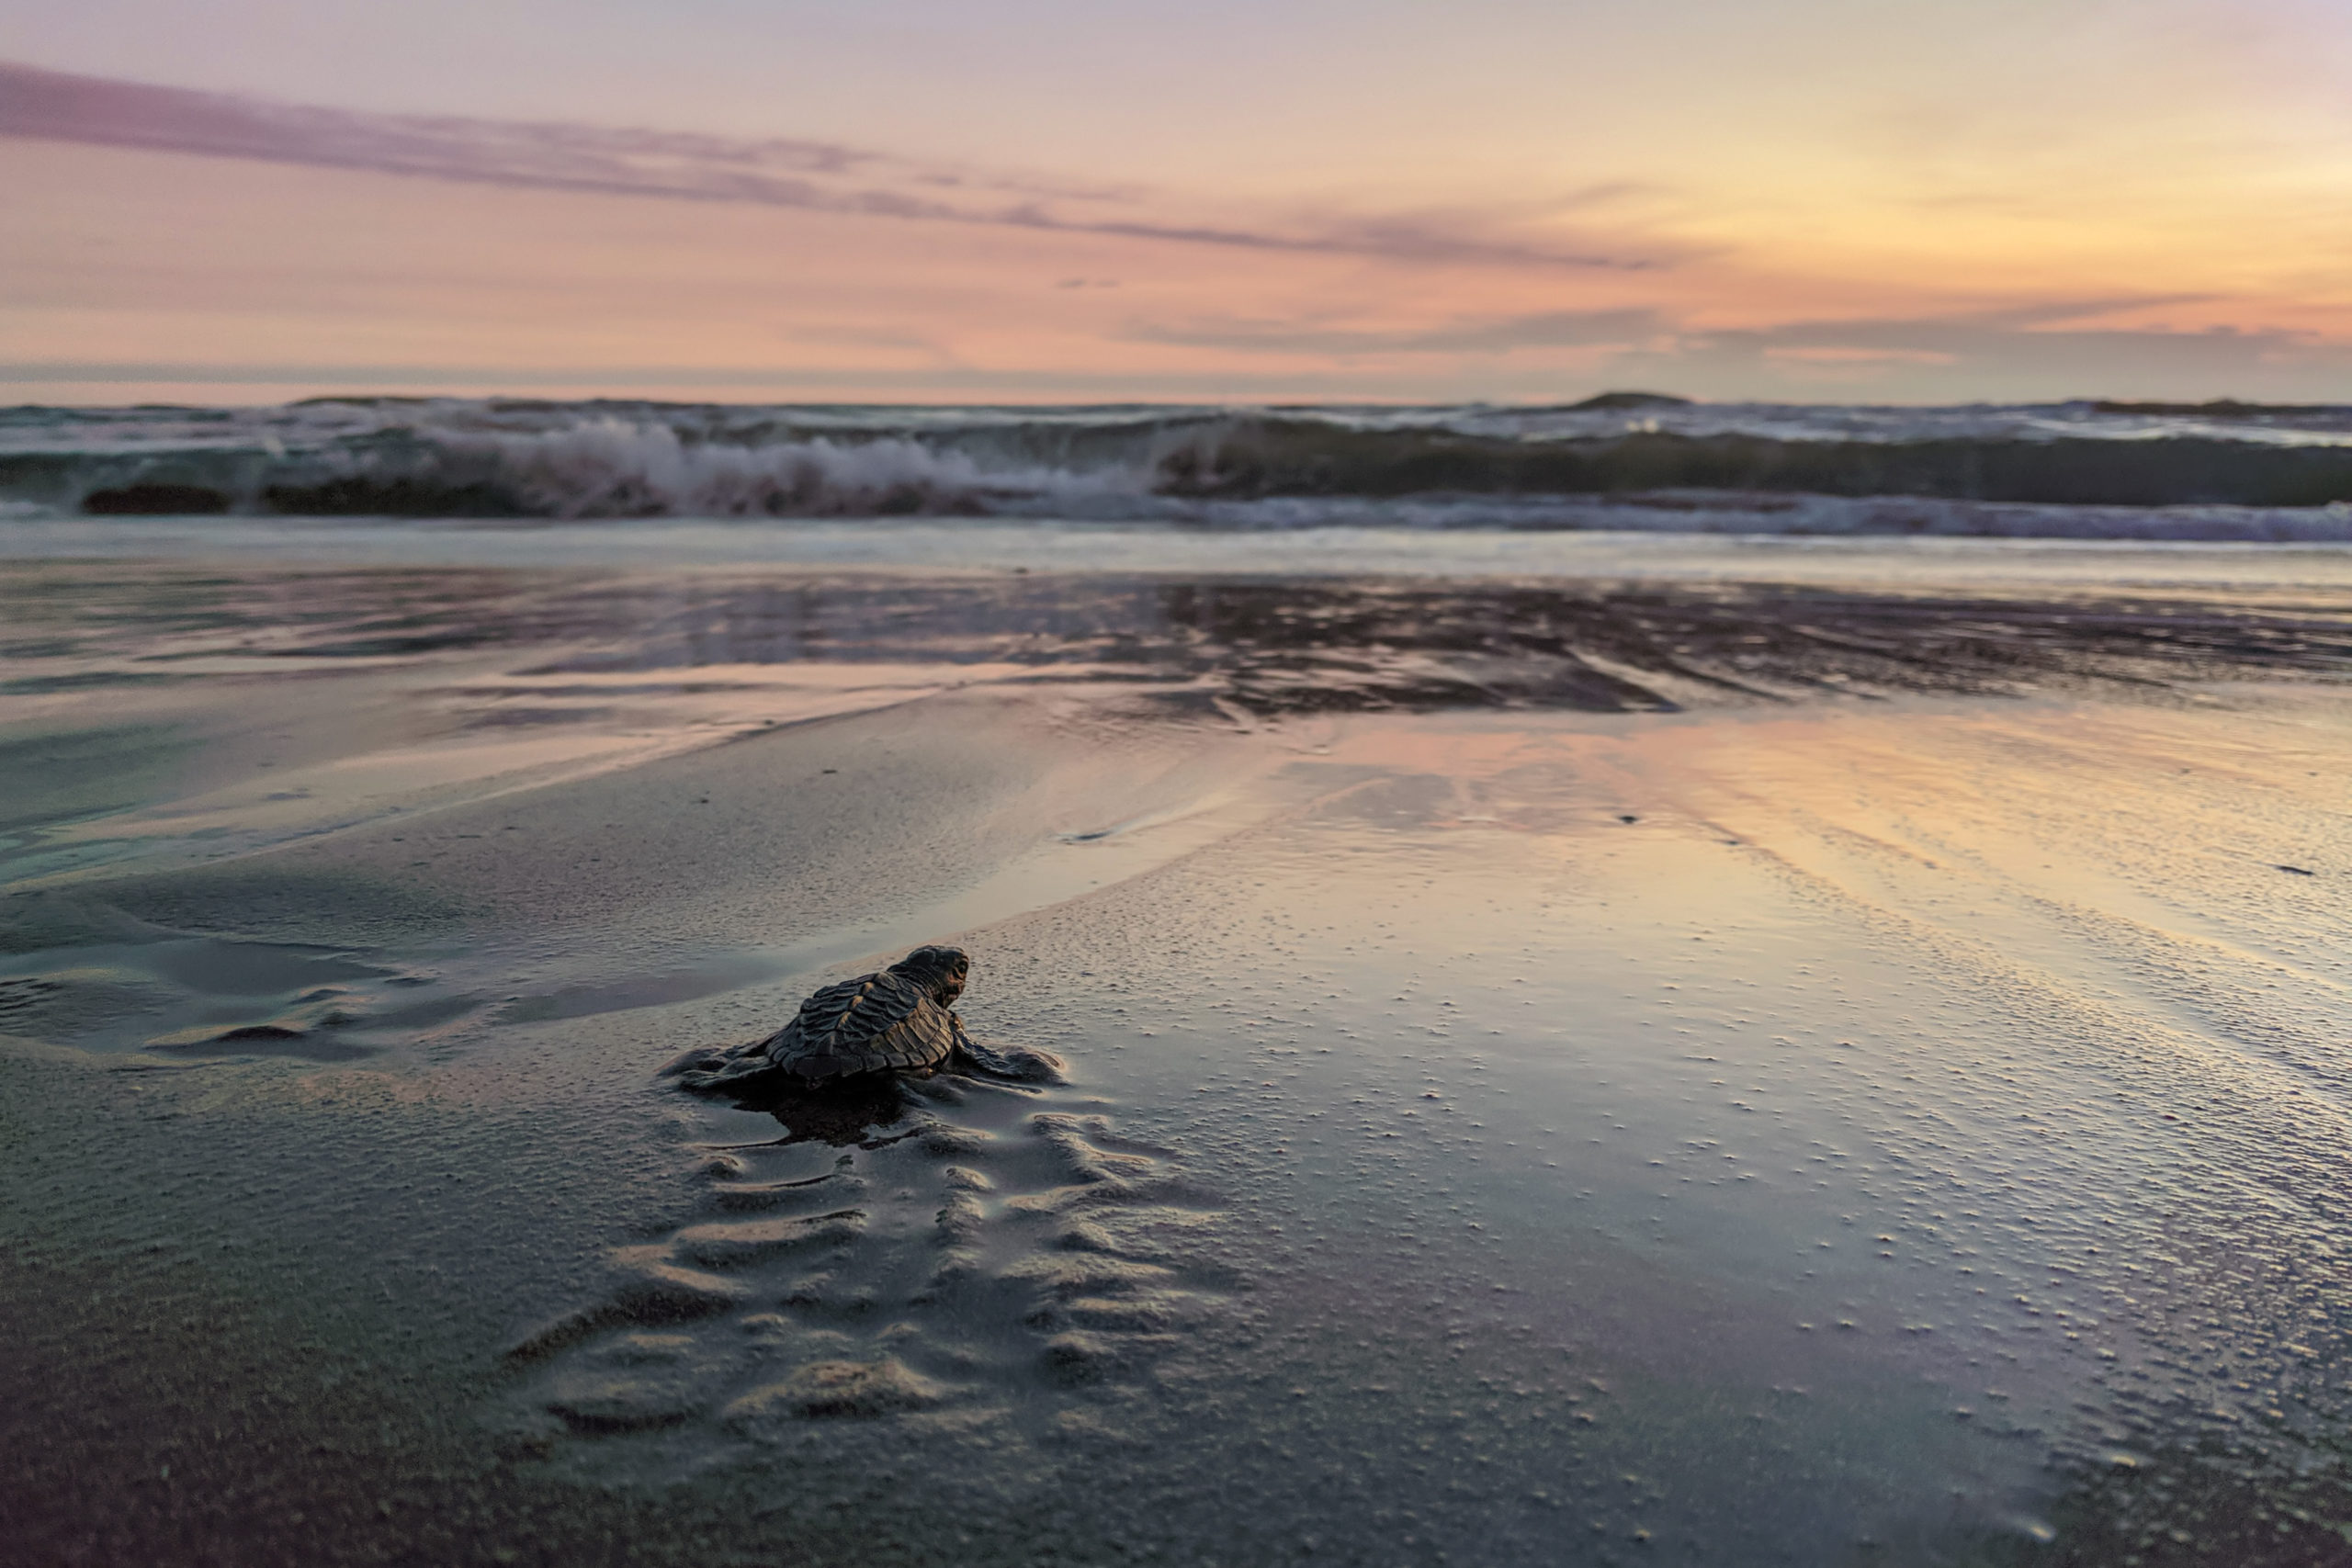 Turtles on a beach (Shutterstock)